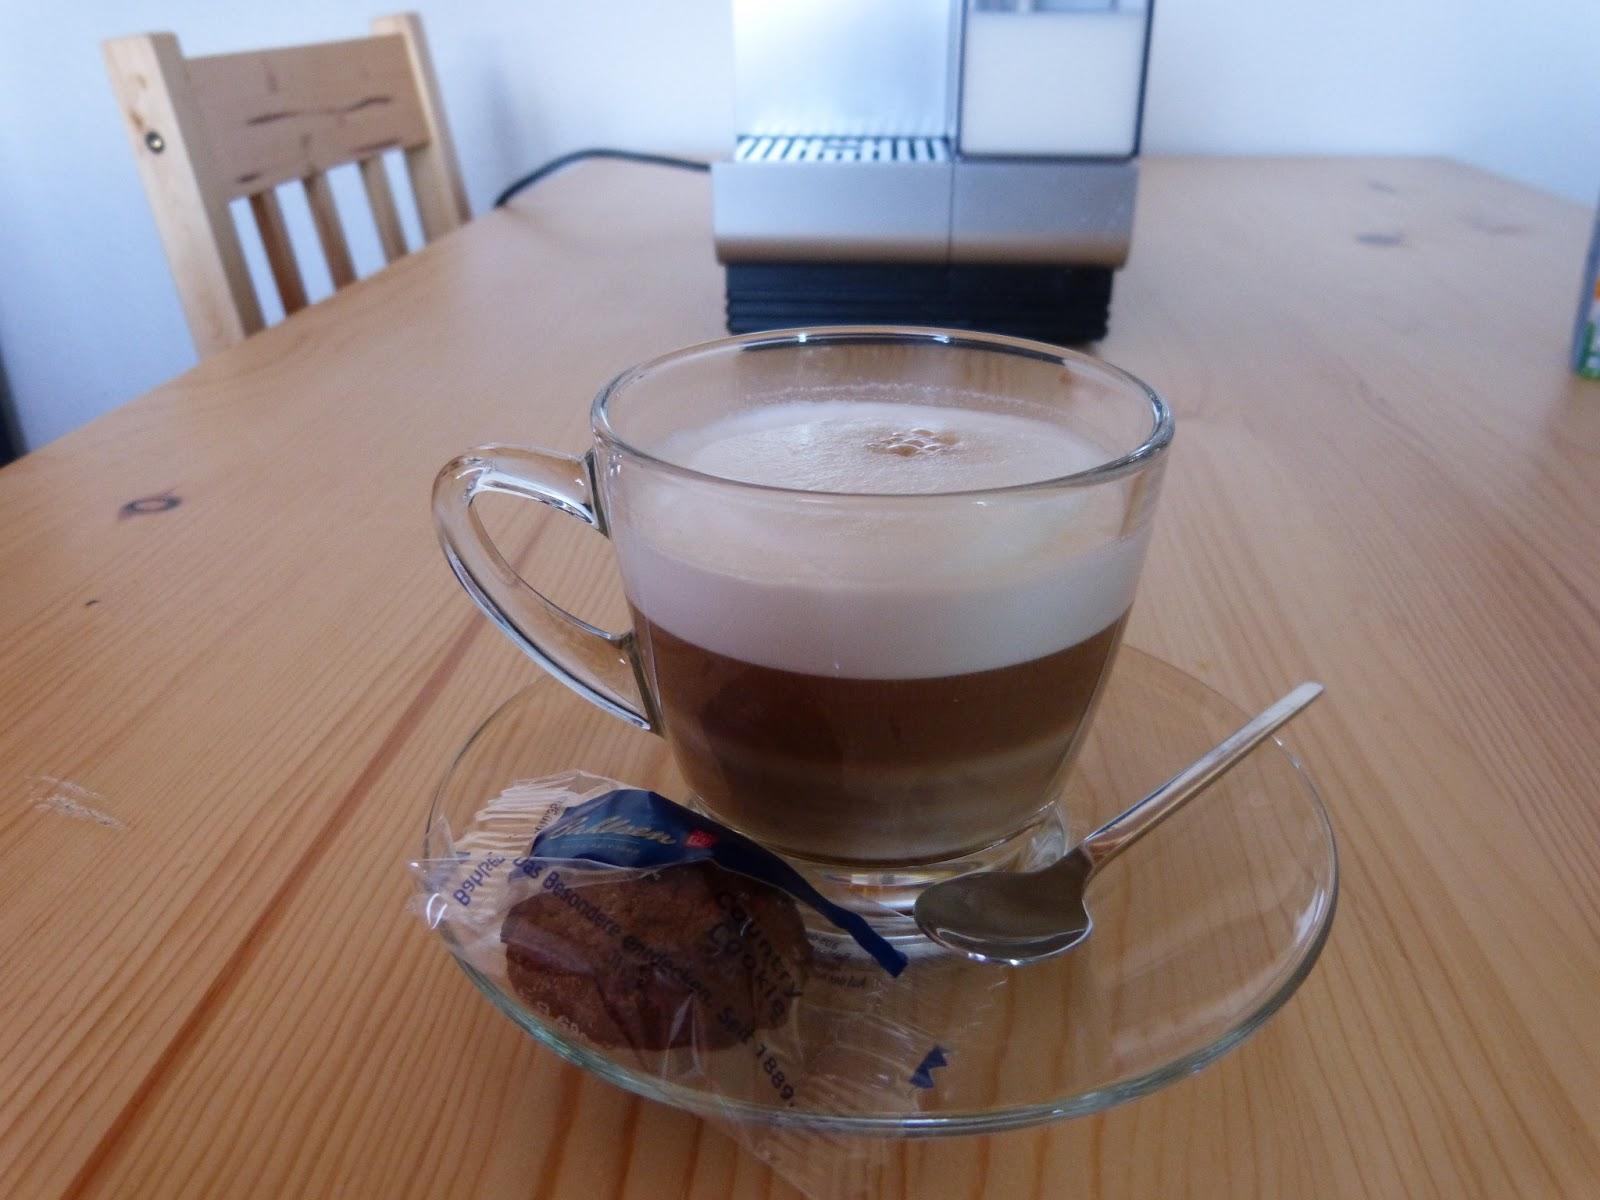 zubereitung von latte macchiato und cappuccino mit der delonghi lattissima kapsel. Black Bedroom Furniture Sets. Home Design Ideas